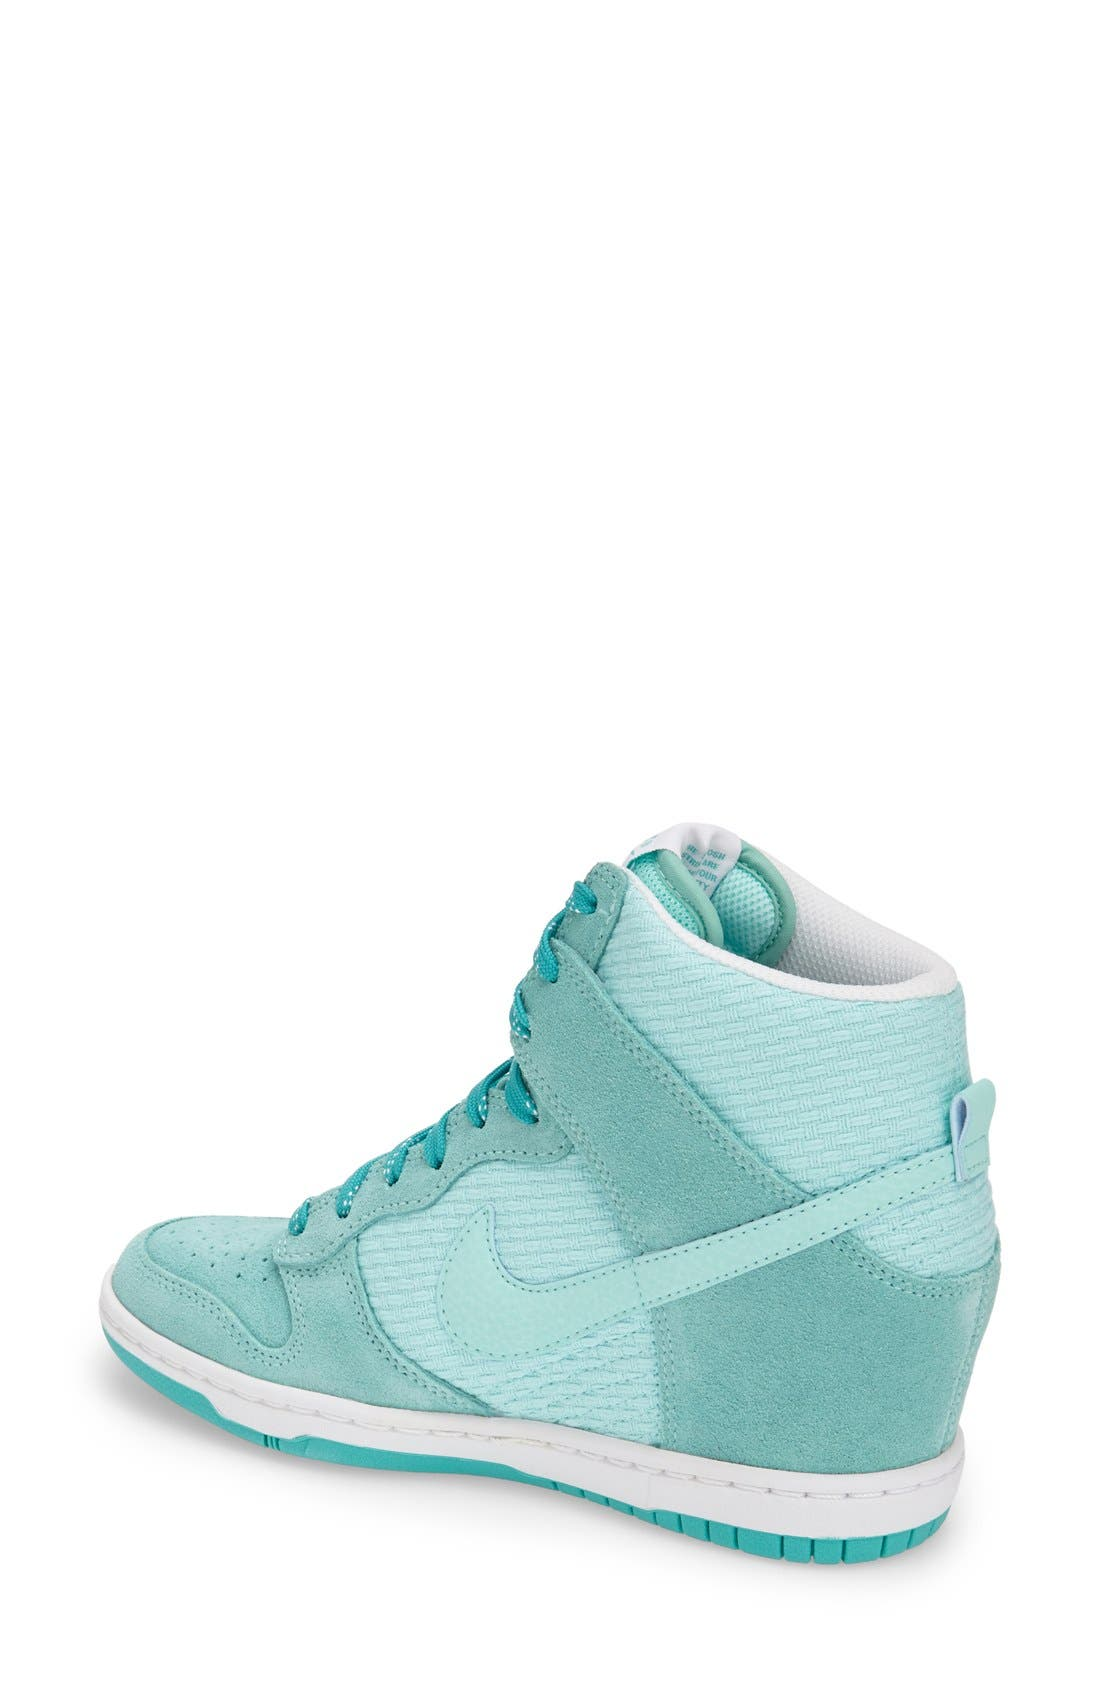 ,                             'Dunk Sky Hi - Essential' Wedge Sneaker,                             Alternate thumbnail 55, color,                             303